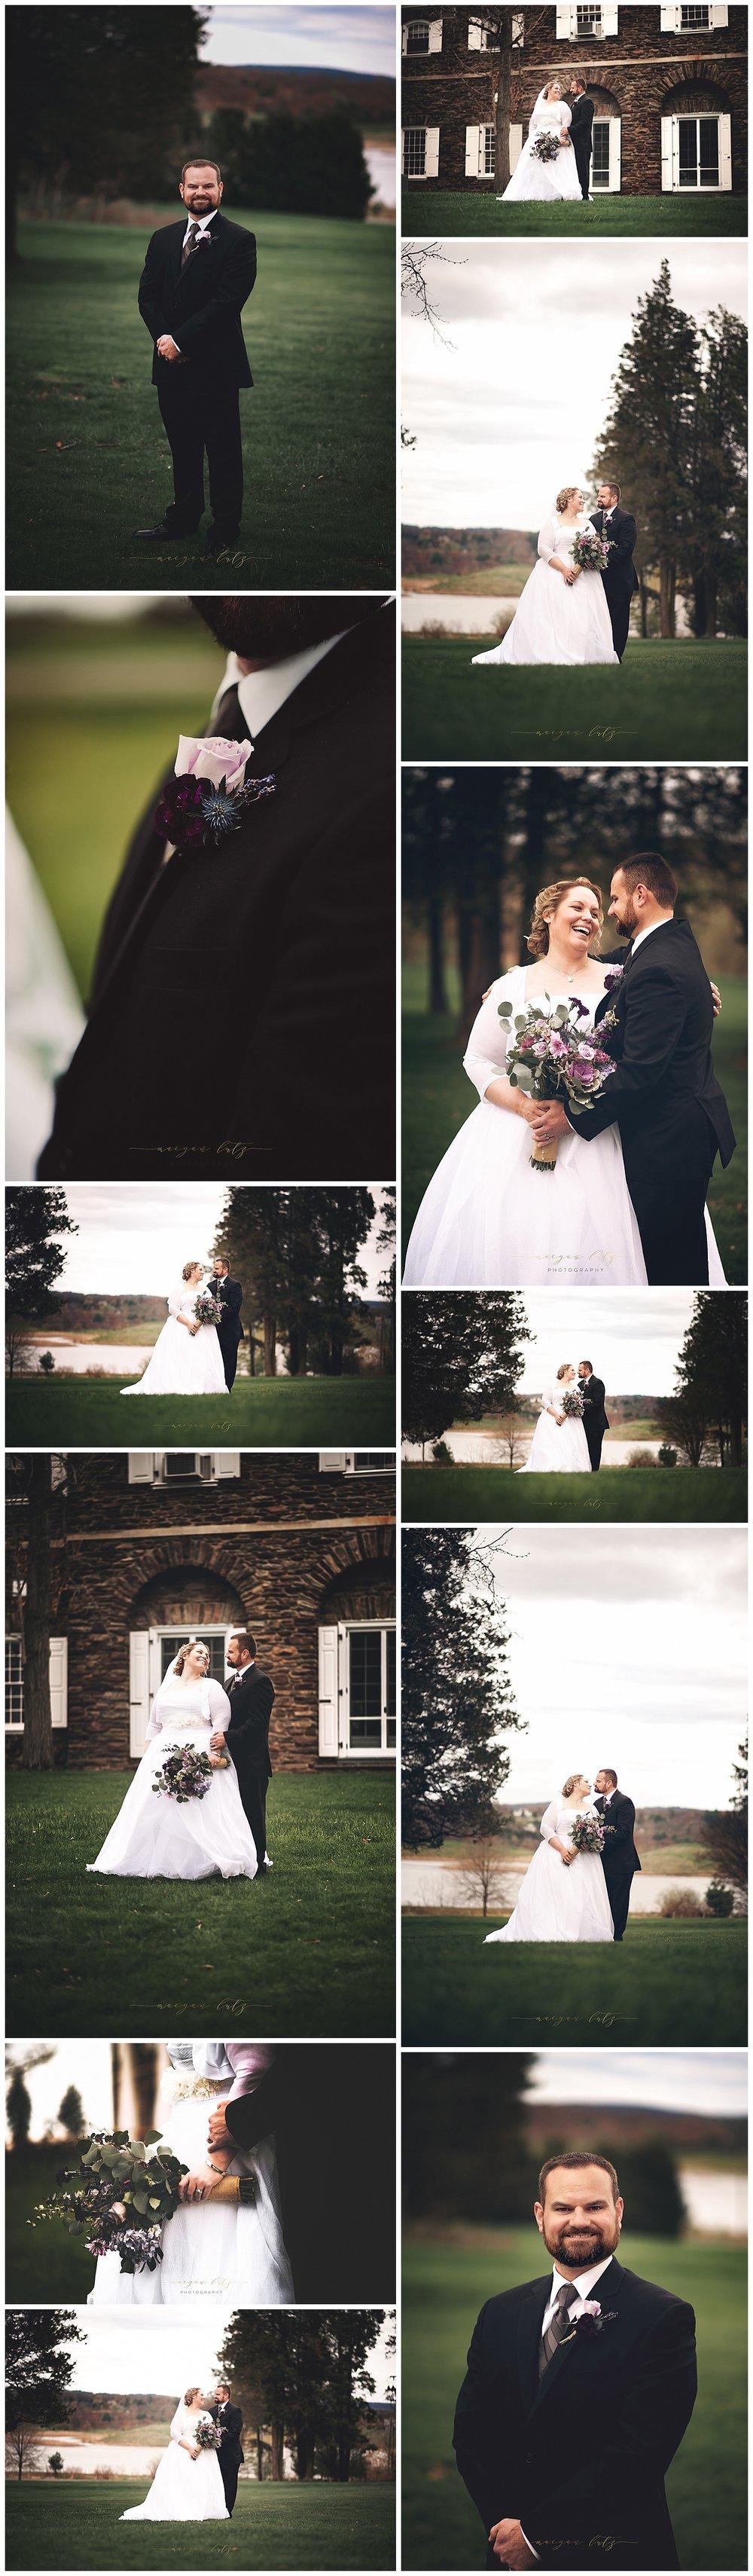 NEPA-Wedding-Photographer-in-Scranton-NEPA_0034.jpg